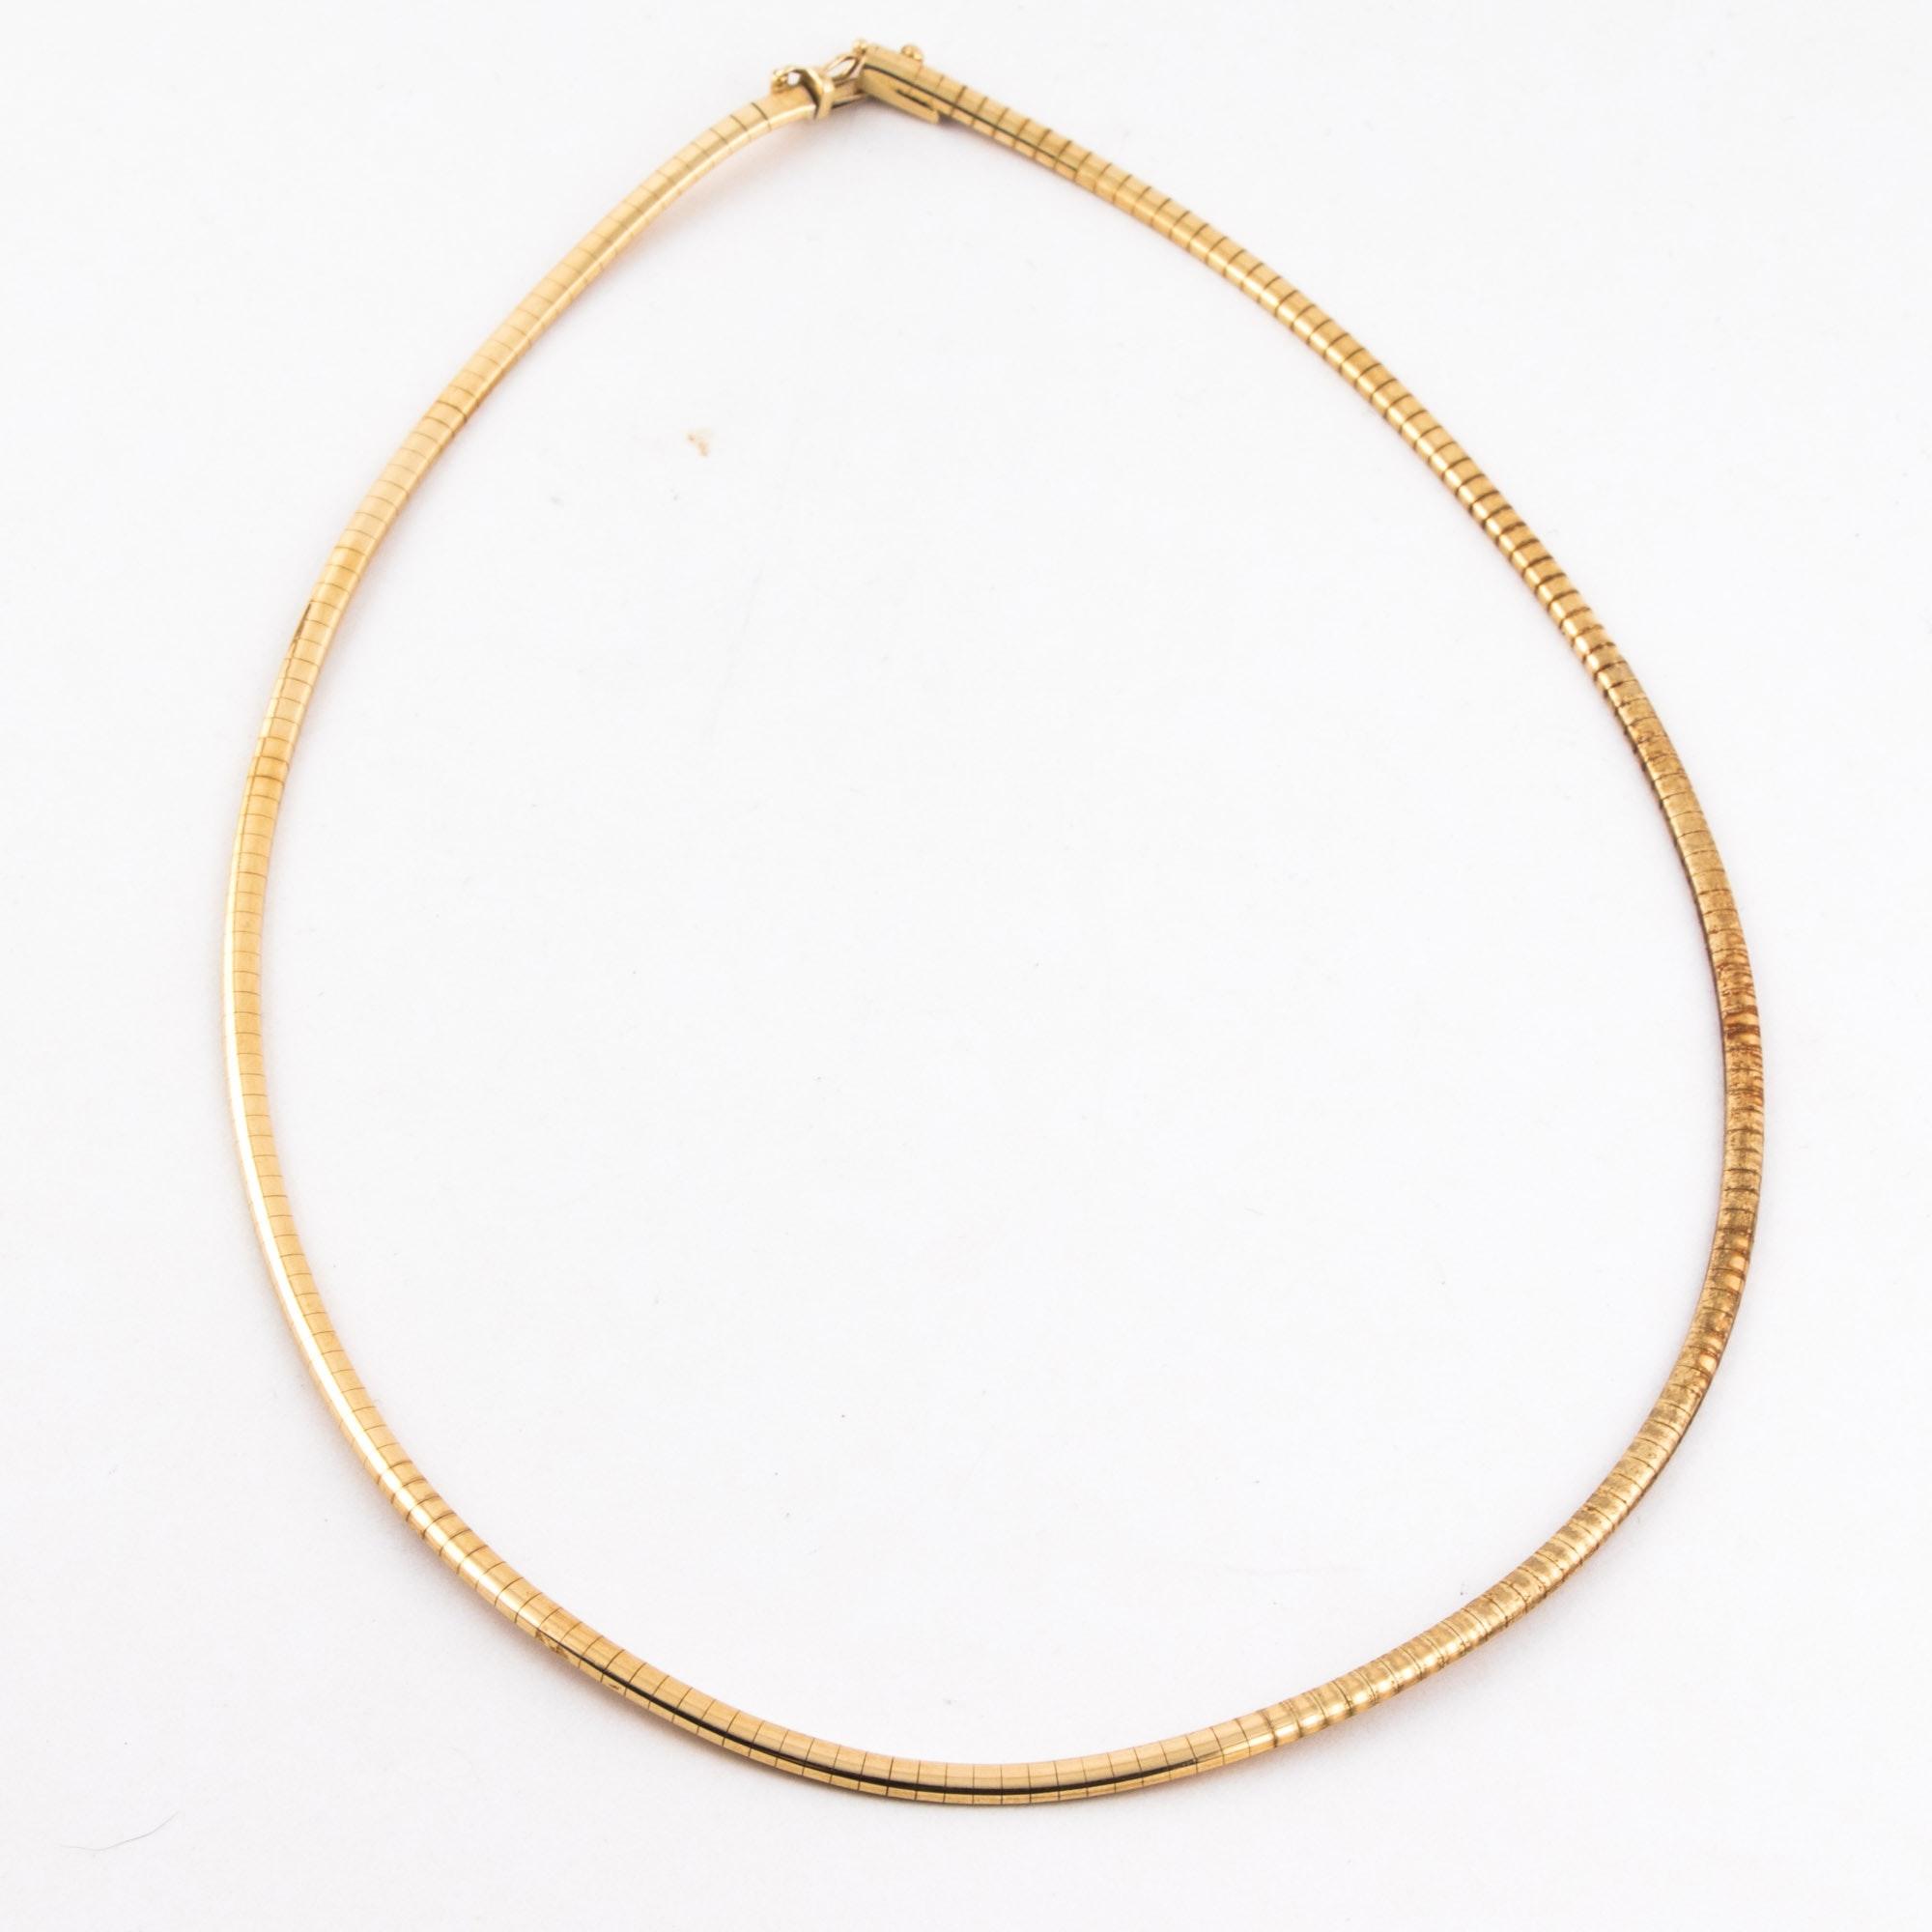 14K Yellow Gold Italian Omega Necklace